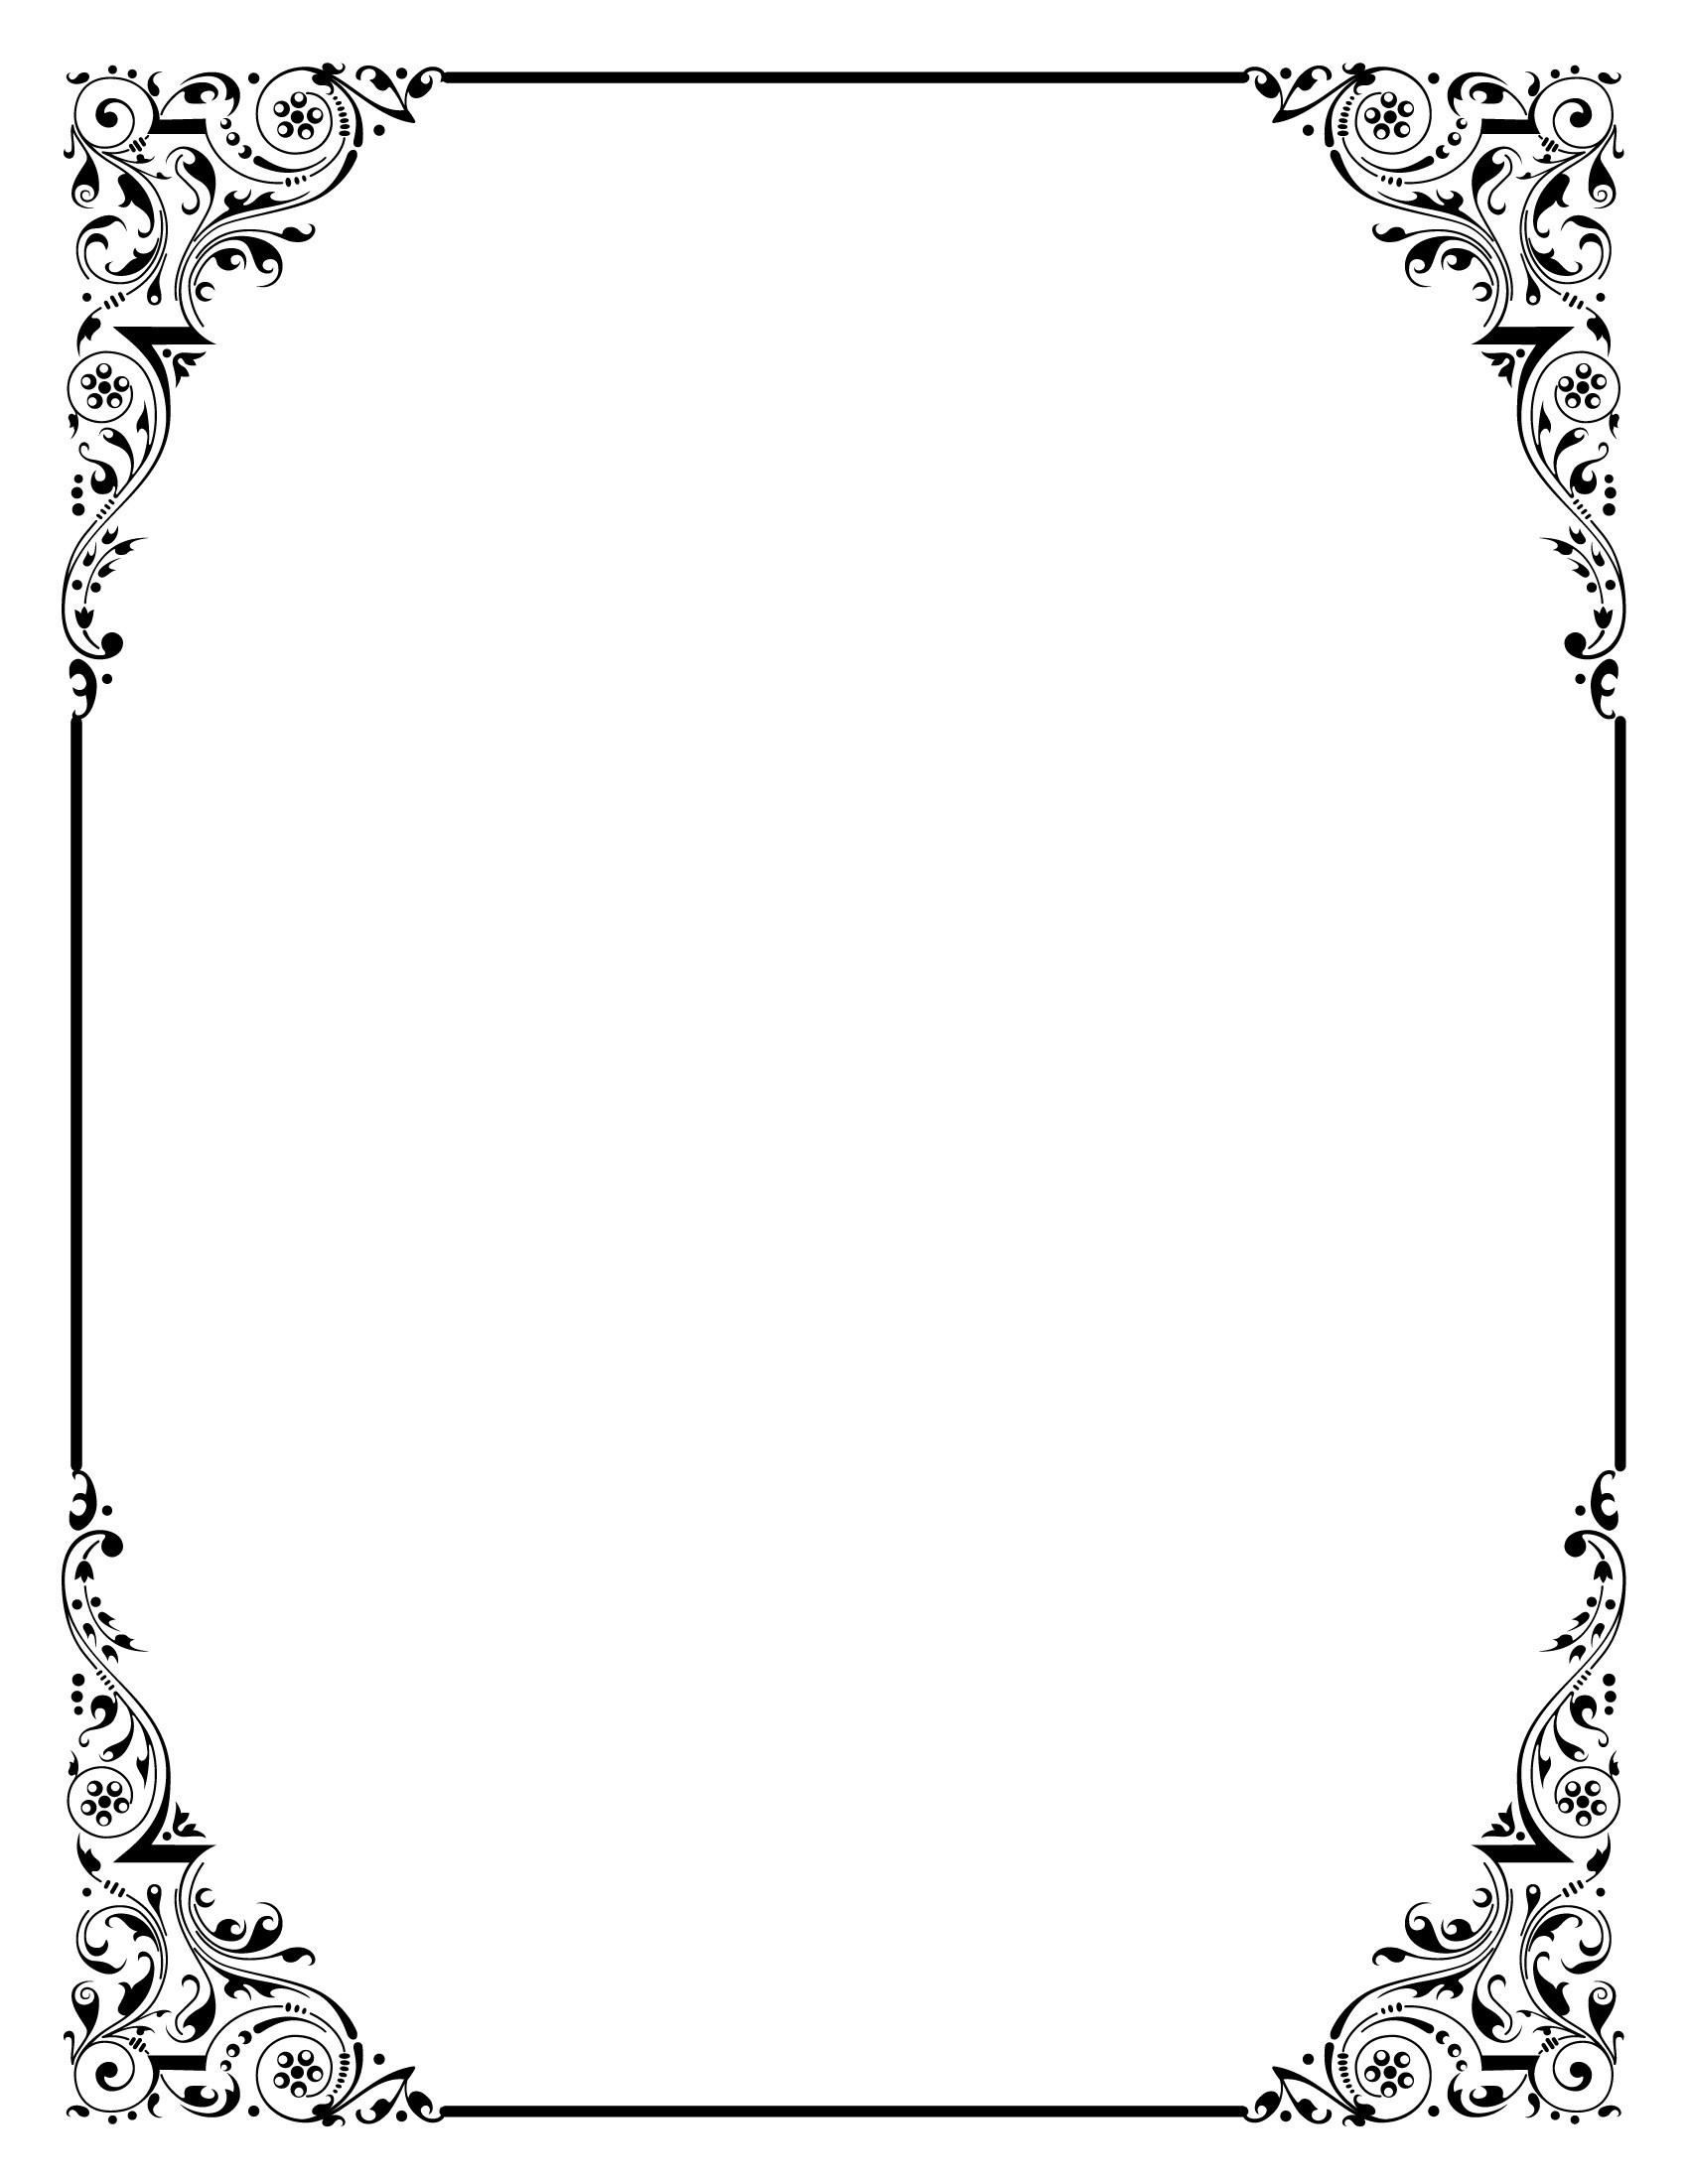 Free elegant border clipart image transparent Elegant border clipart free 7 » Clipart Portal image transparent